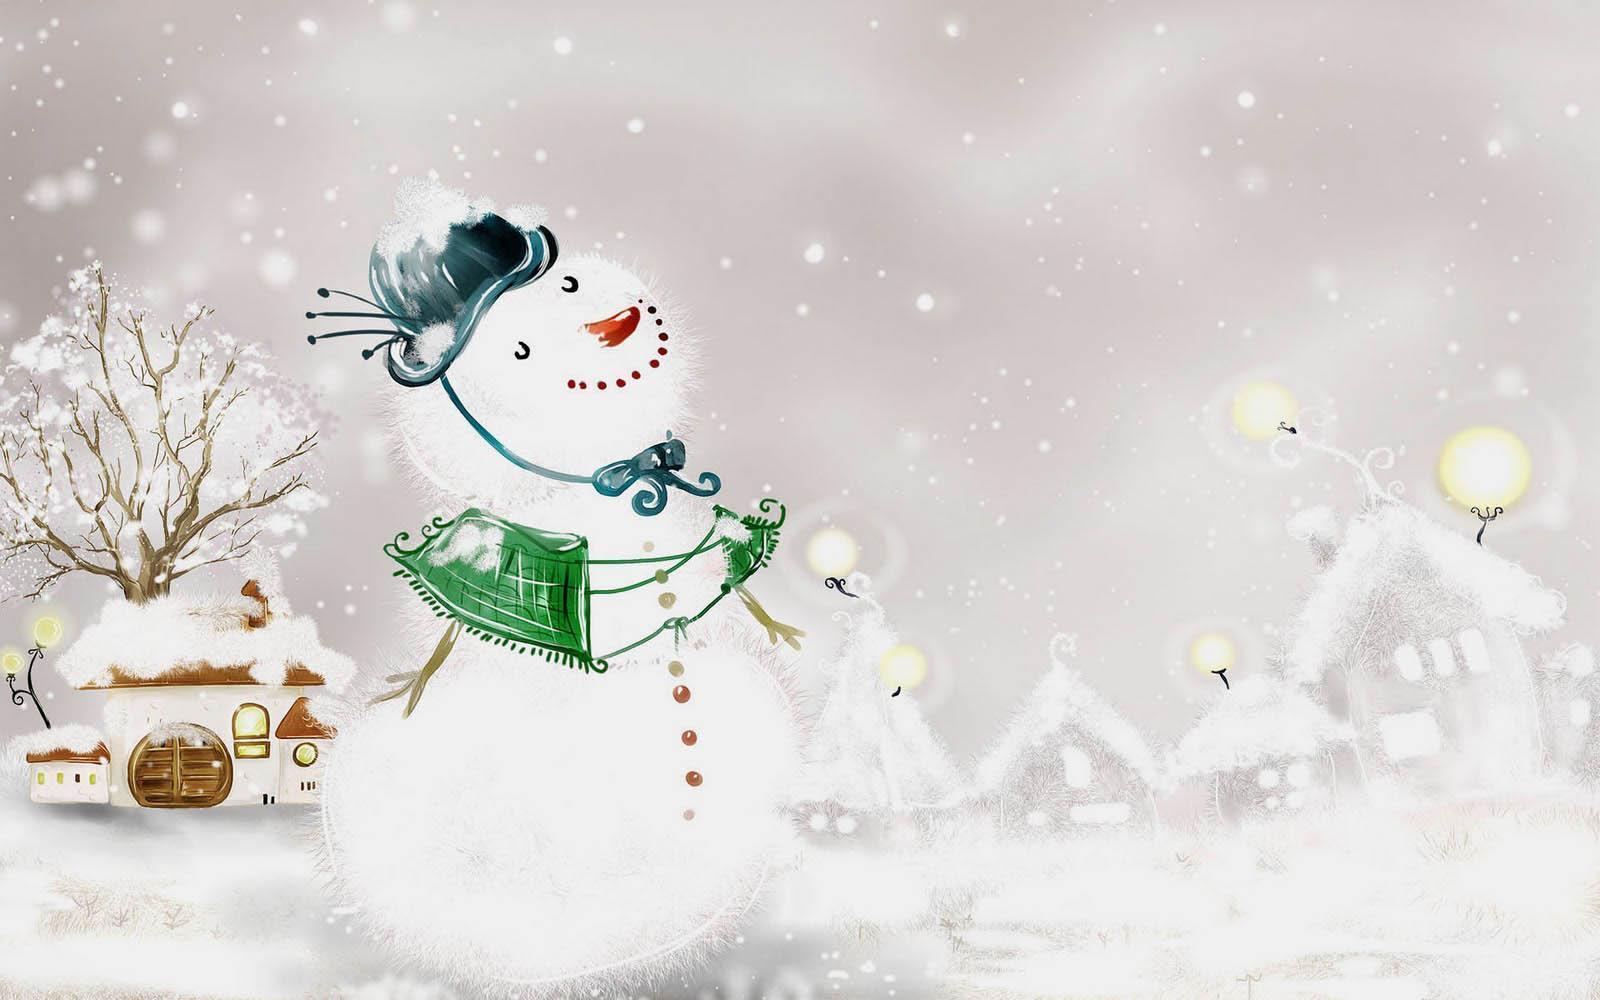 Christmas Snowman Desktop Wallpaper - WallpaperSafari